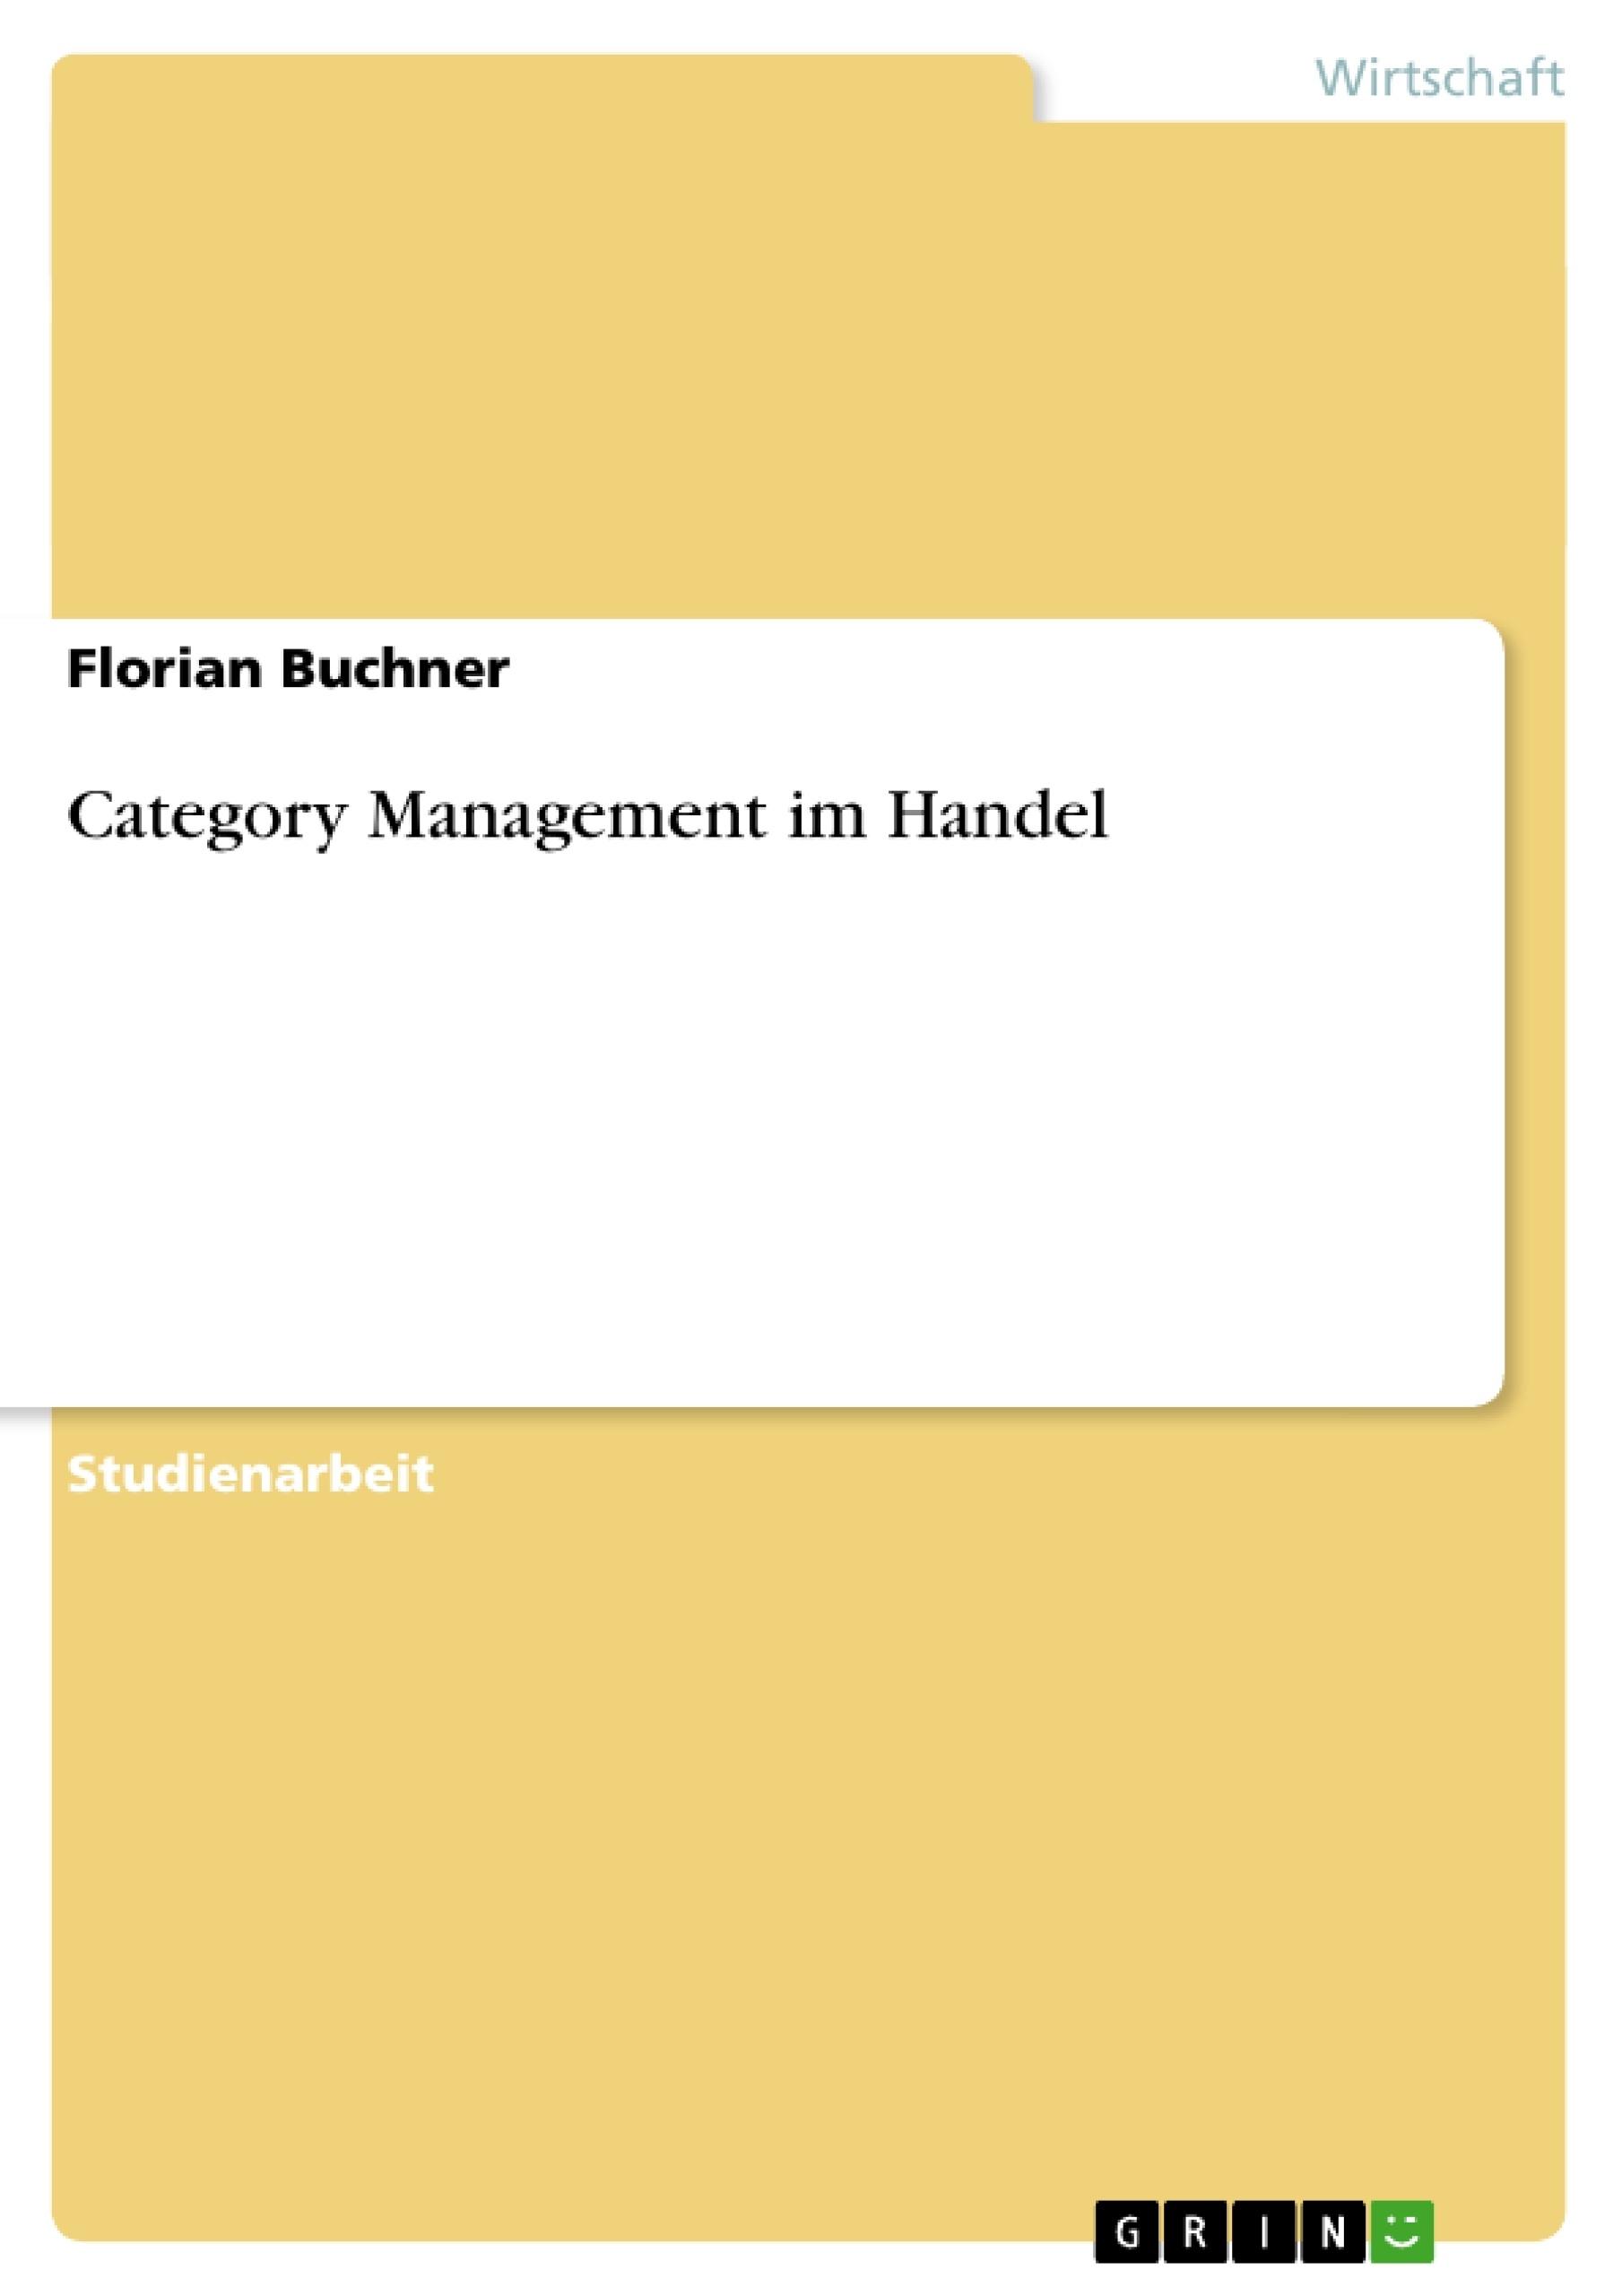 Titel: Category Management im Handel